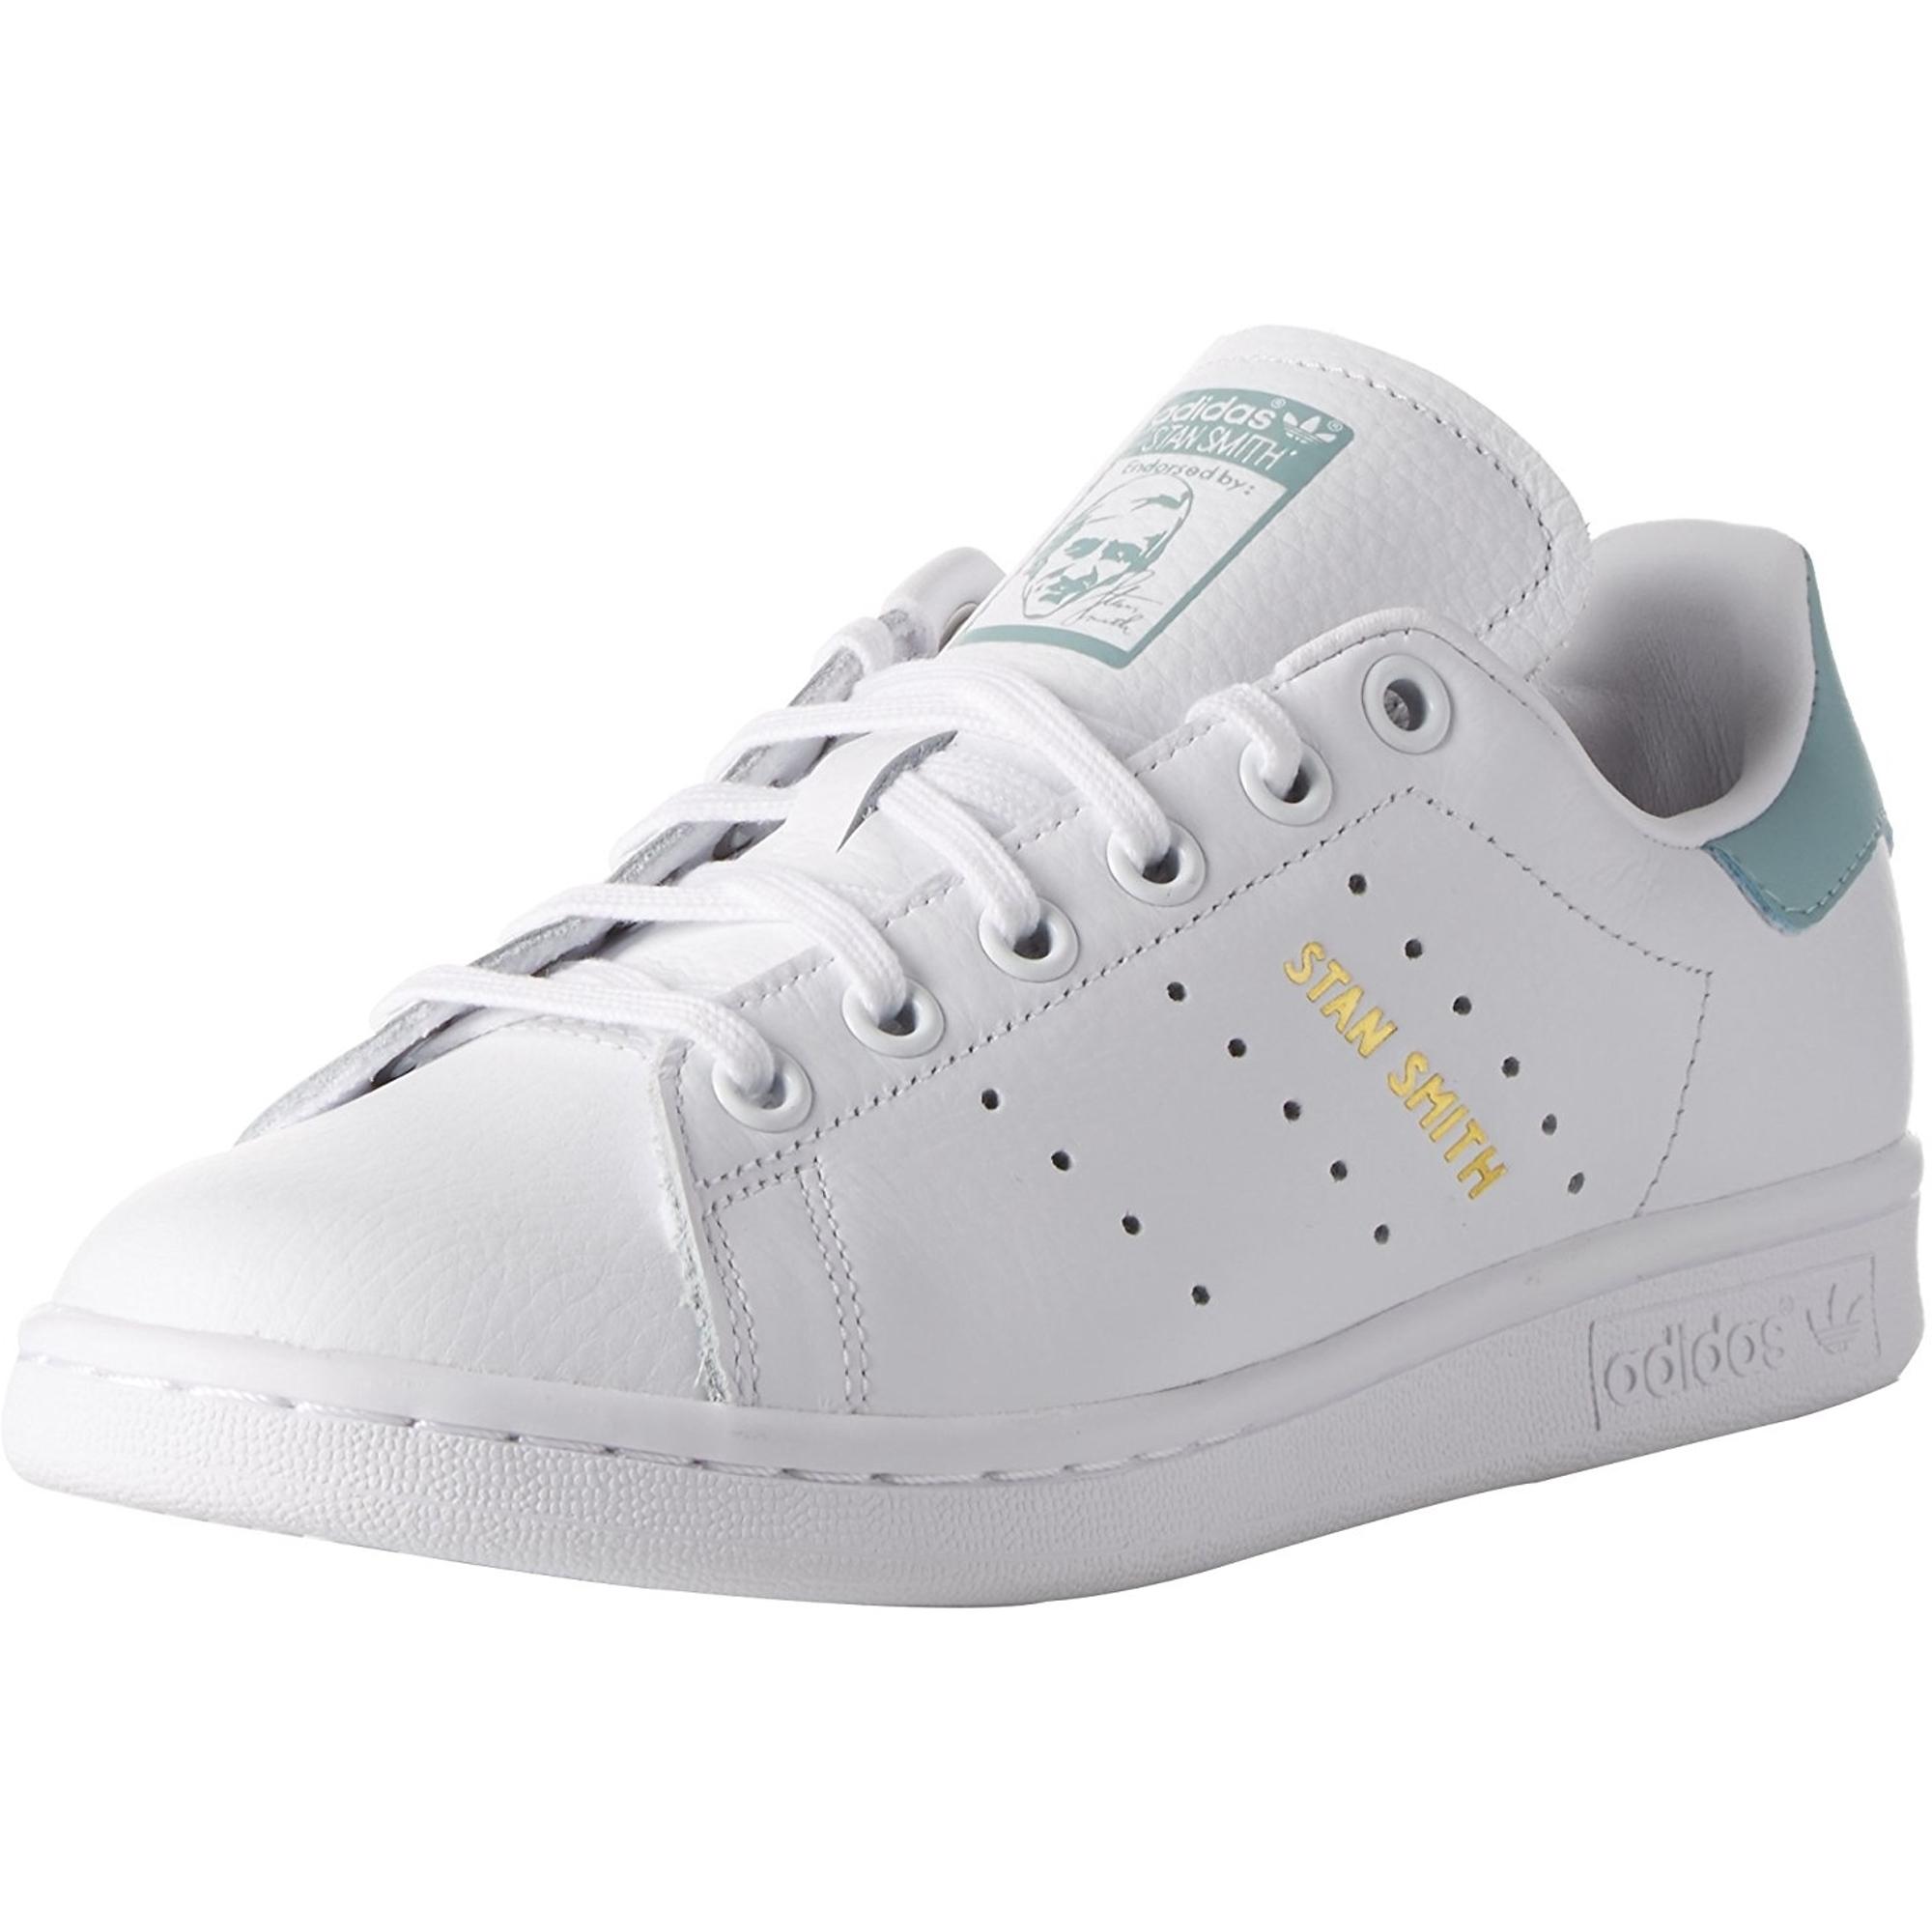 adidas originals tubular doom sock scarpe da ginnastica in bianca